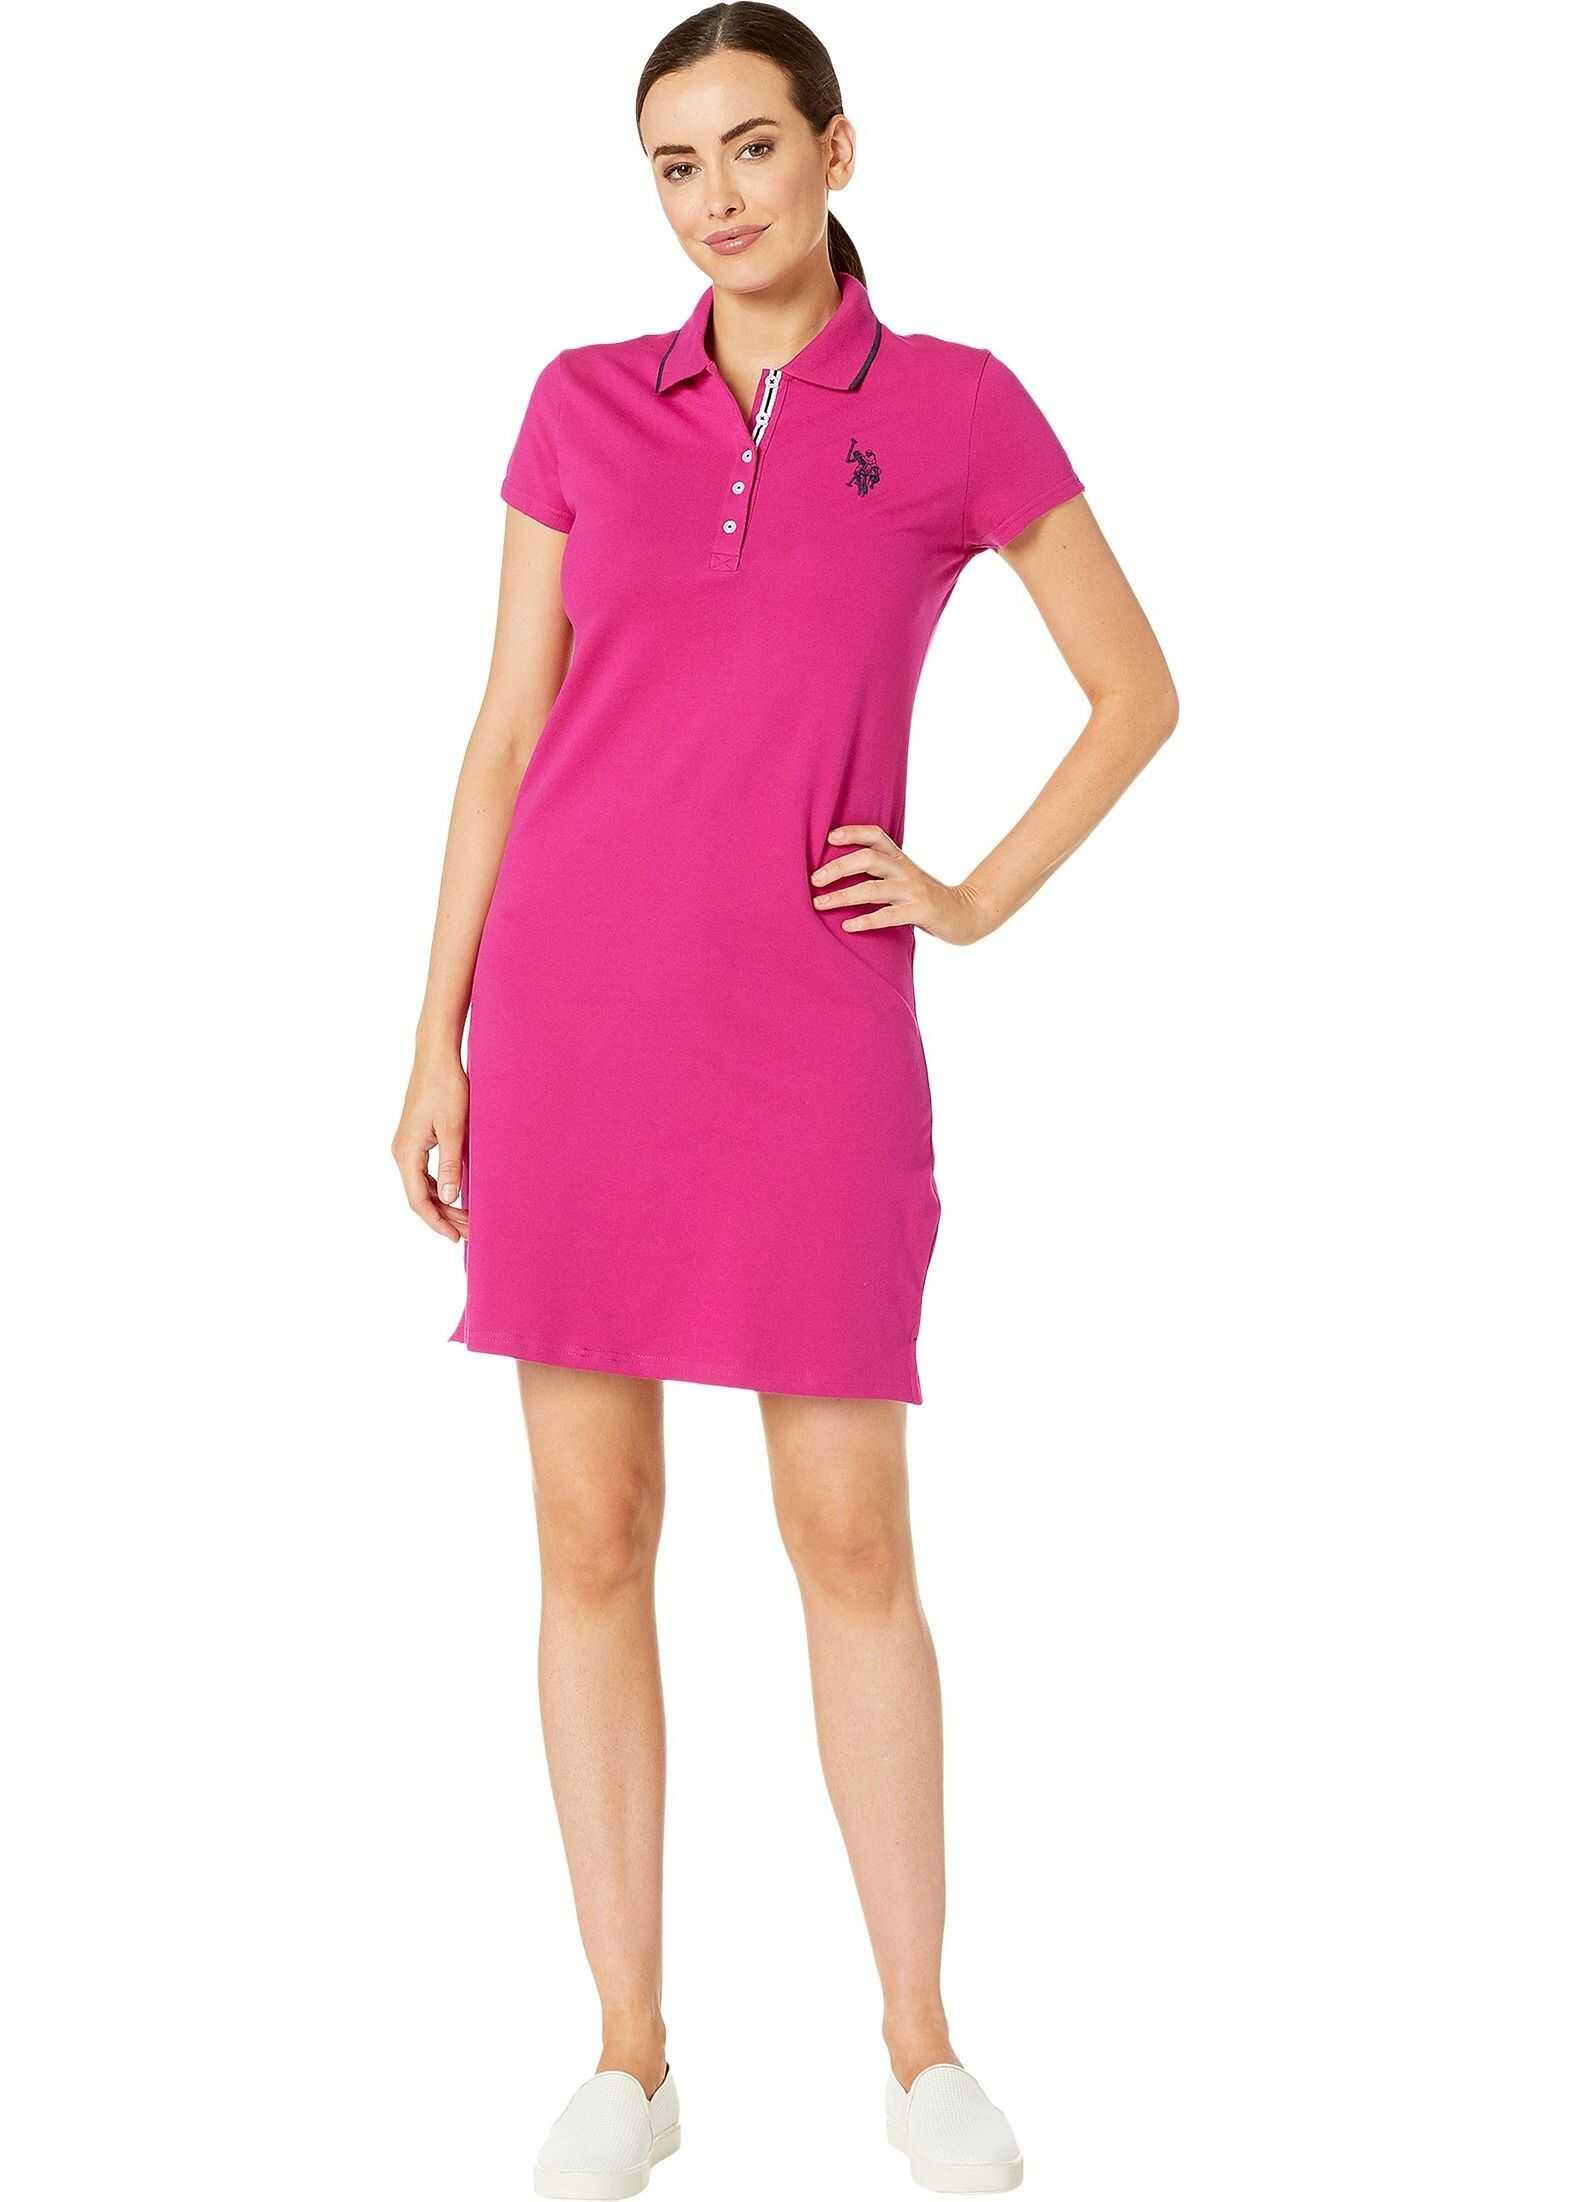 U.S. POLO ASSN. Plain Polo Dress Le Rouge